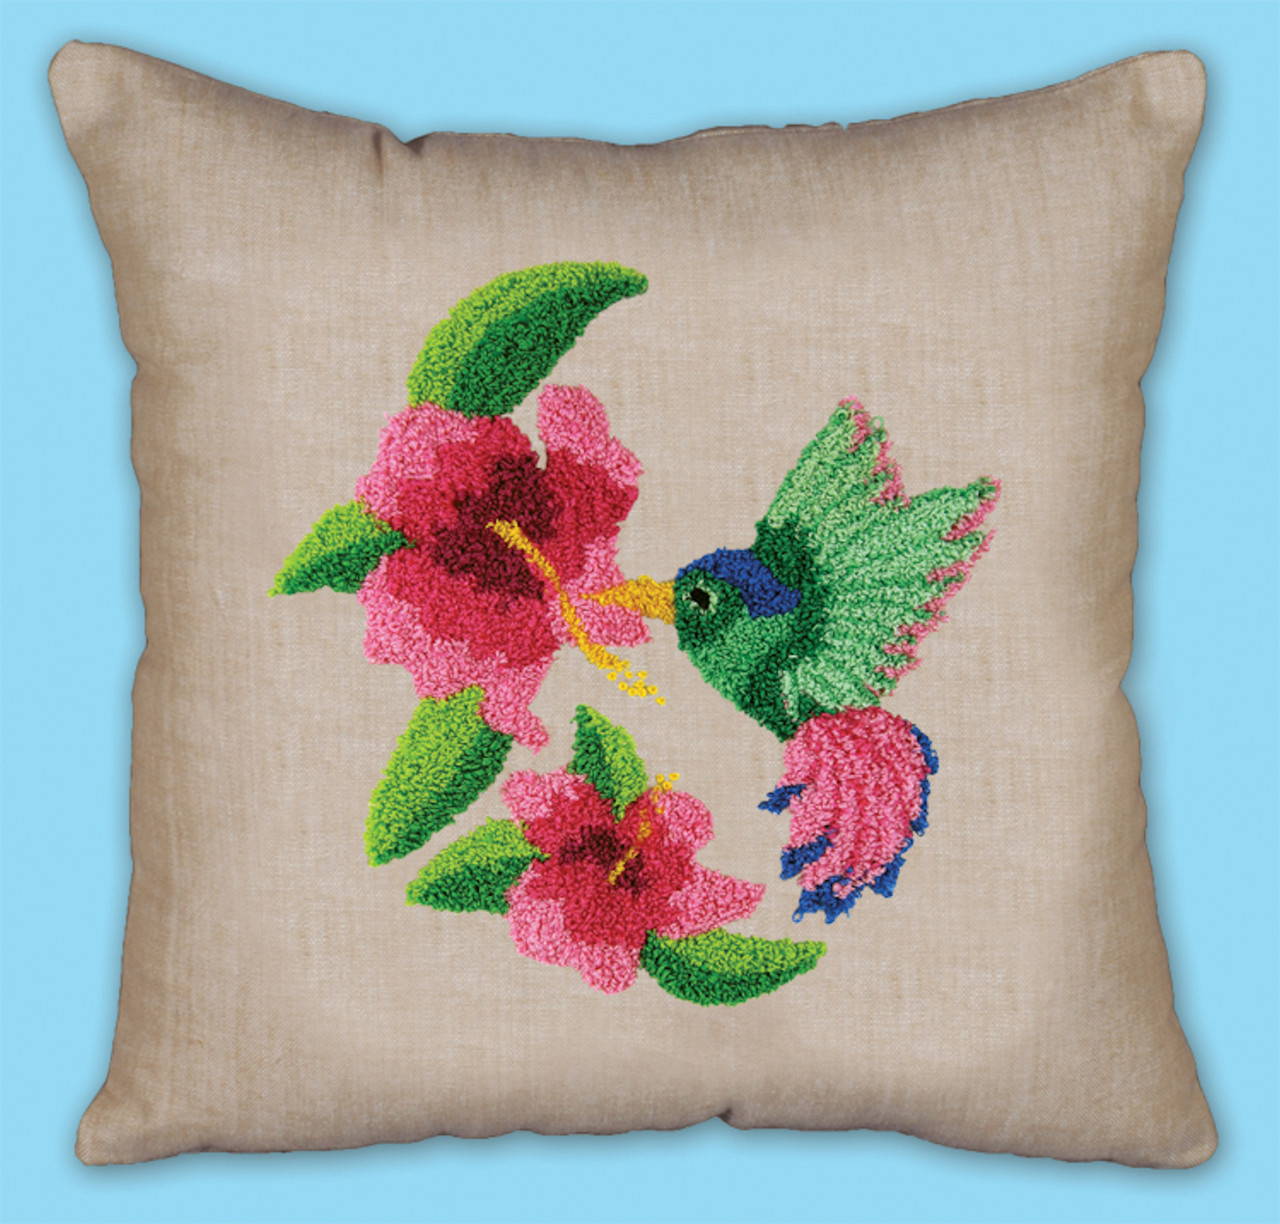 Punch Needle Pillow Kit - Hummingbird